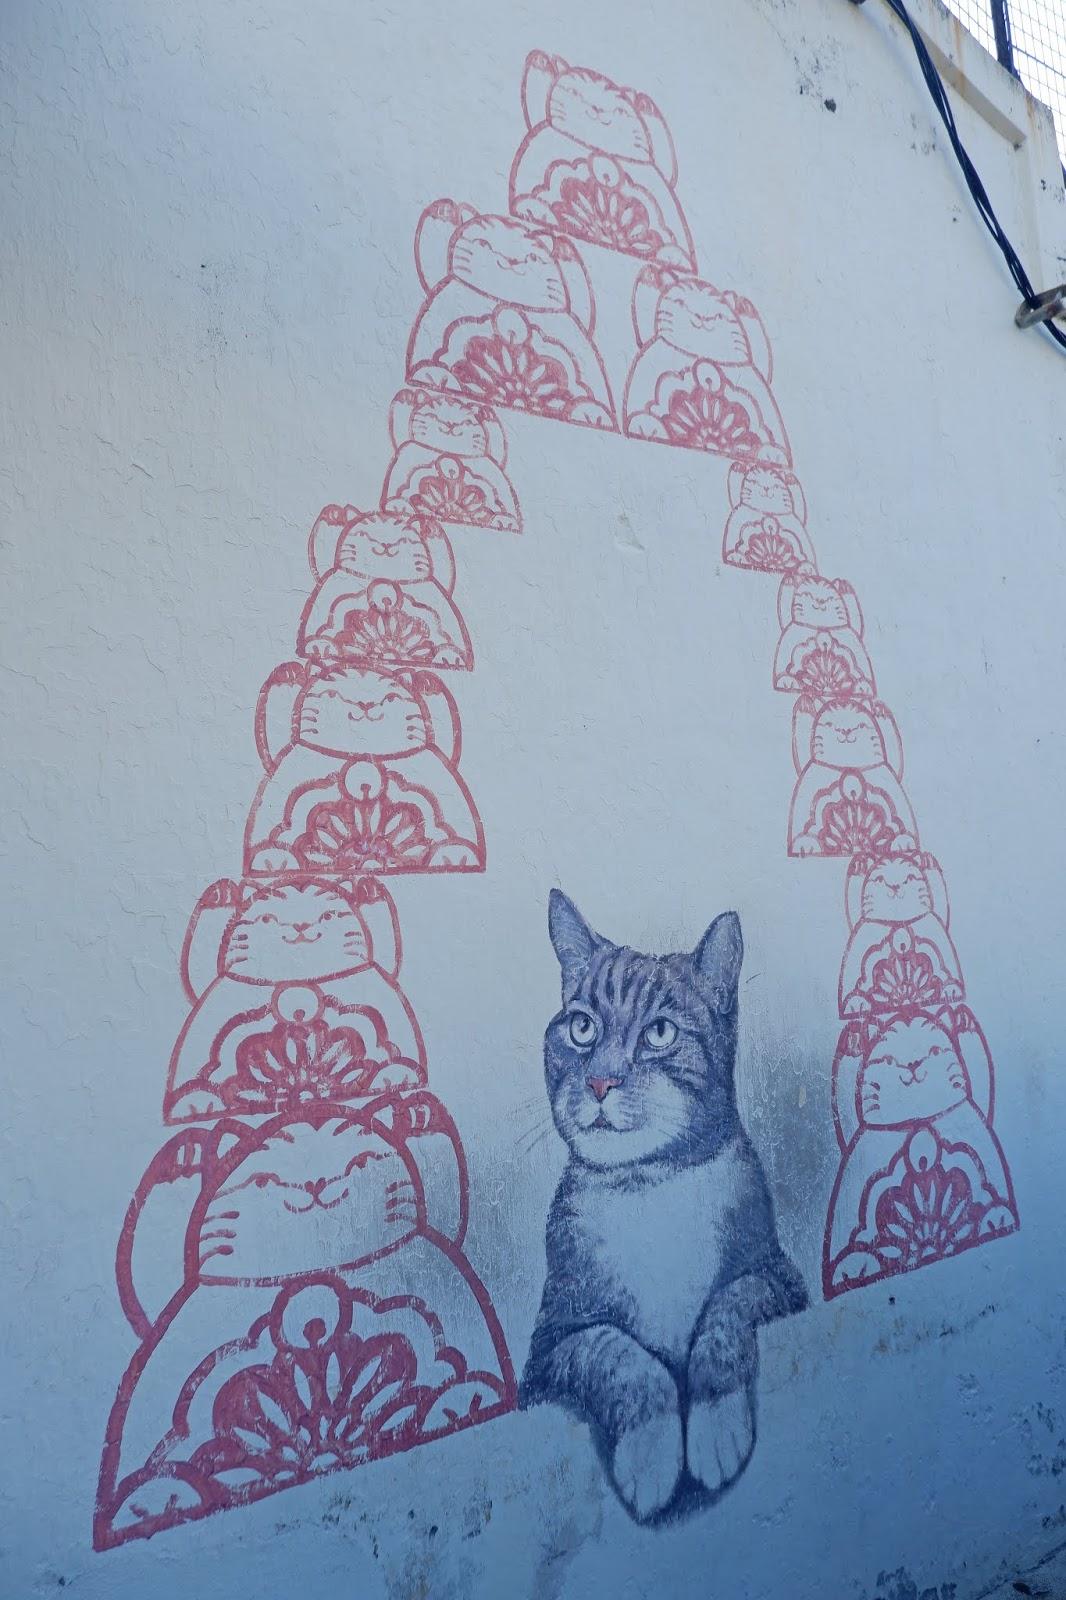 penang street art (5)